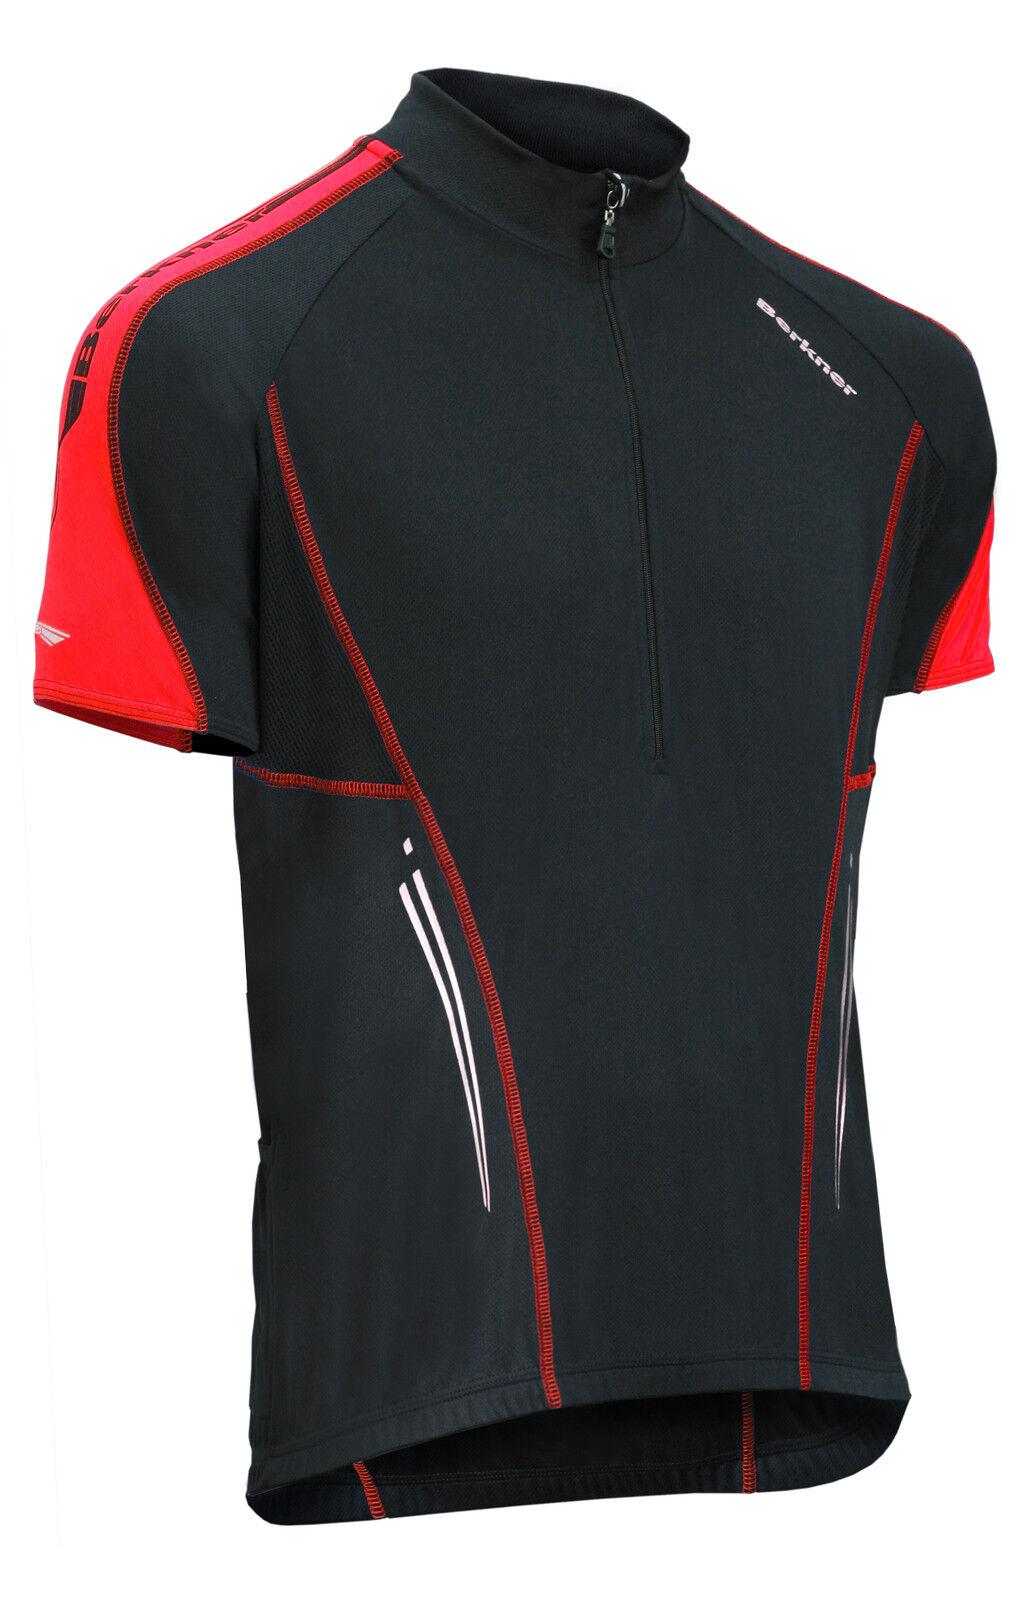 Biketrikot, Bikeshirt, Fahrradtrikot Berkner NATHAN MTB-Shirt bis 5 XL Übergröße